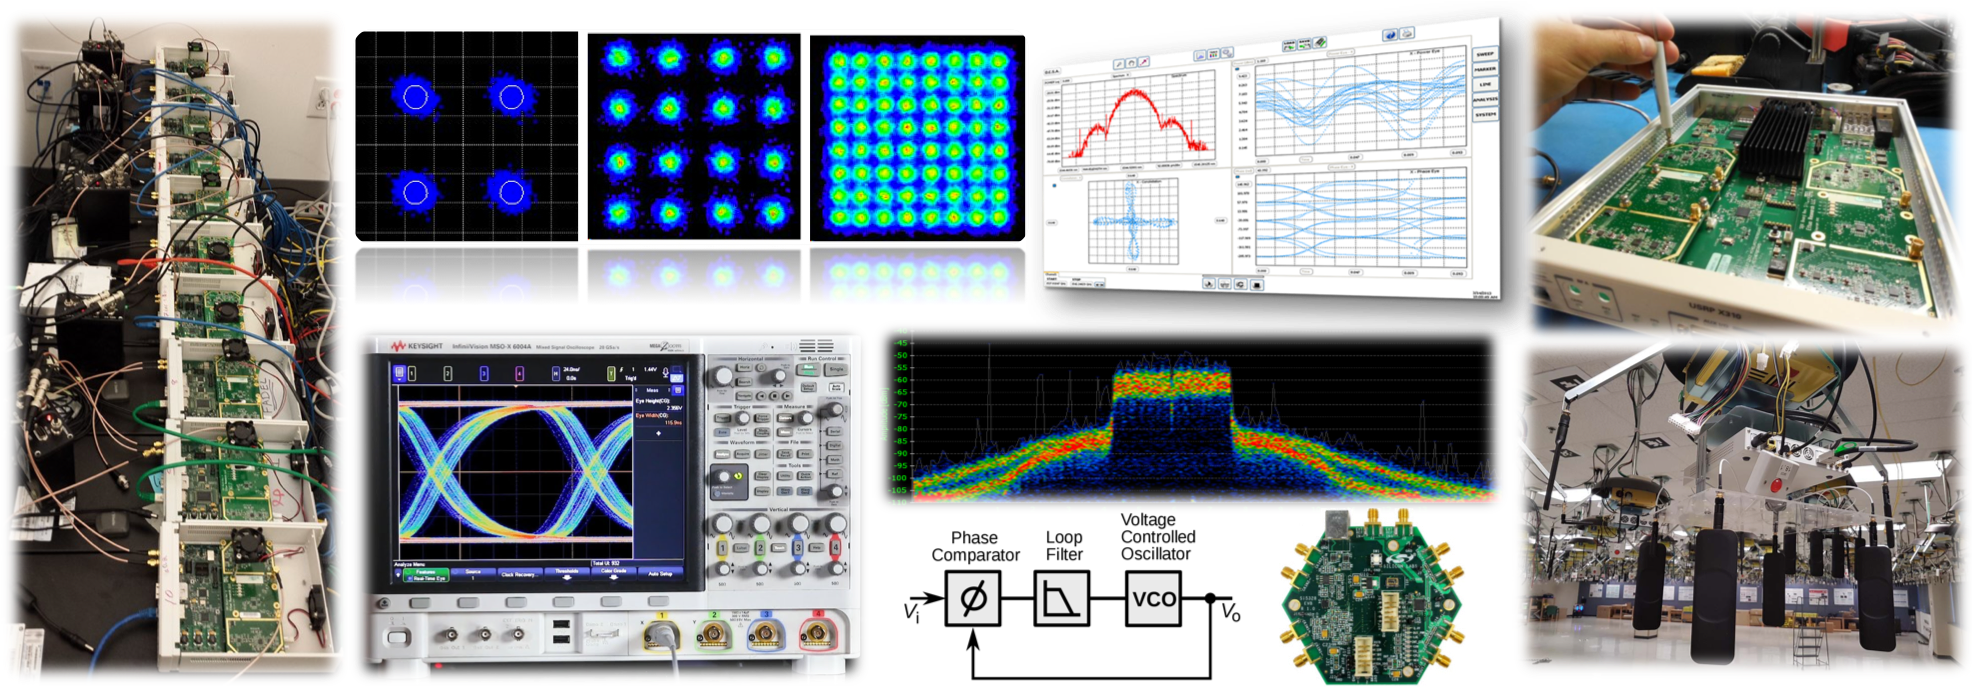 ECE 463: Digital Communications Laboratory